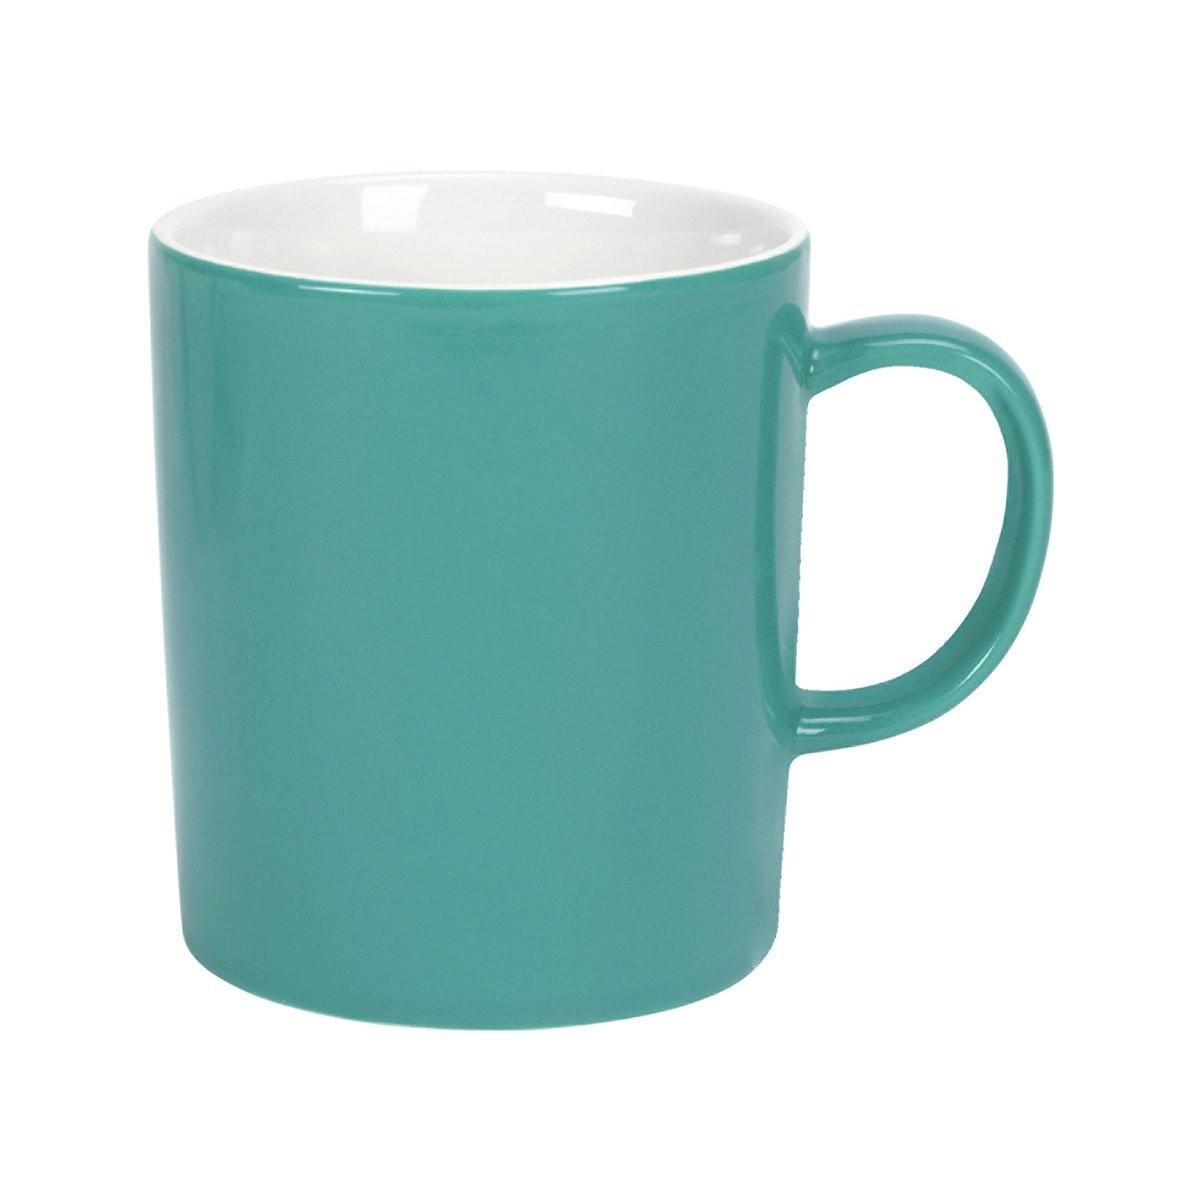 MIX IT! Hrnek na kávu 250 ml - sv. modrá